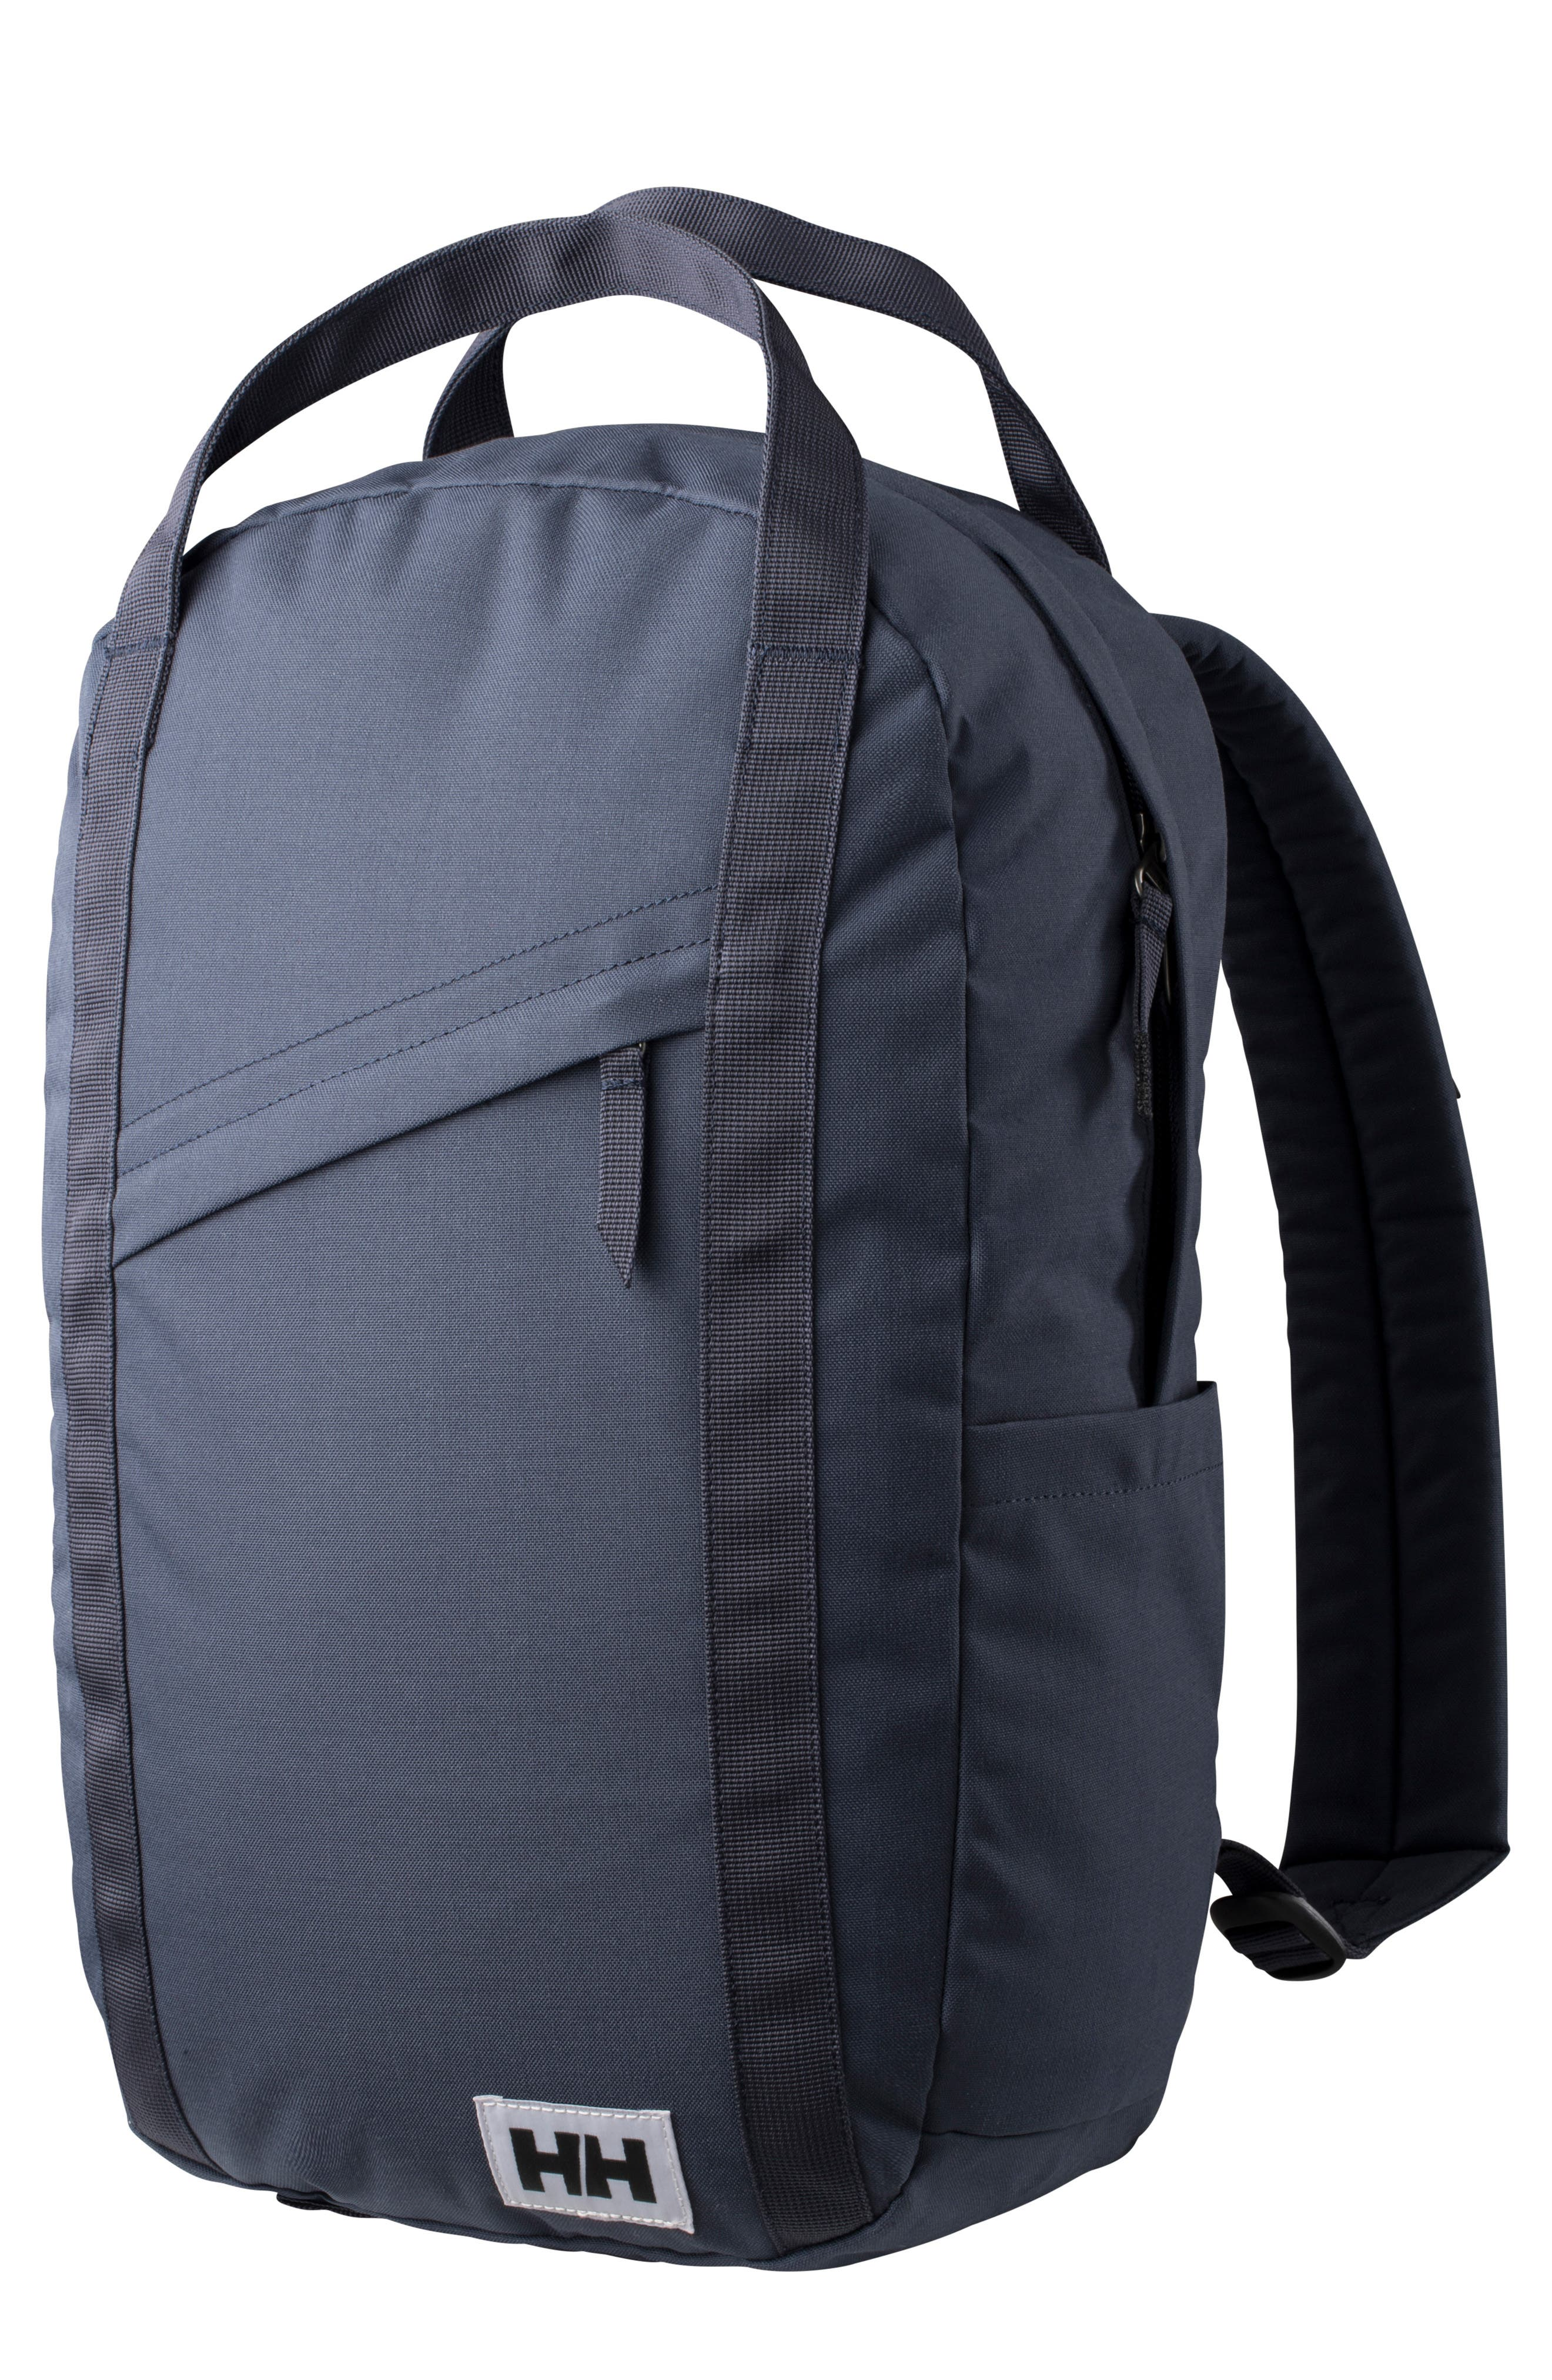 HELLY HANSEN Oslo Backpack - Grey in Graphite Blue